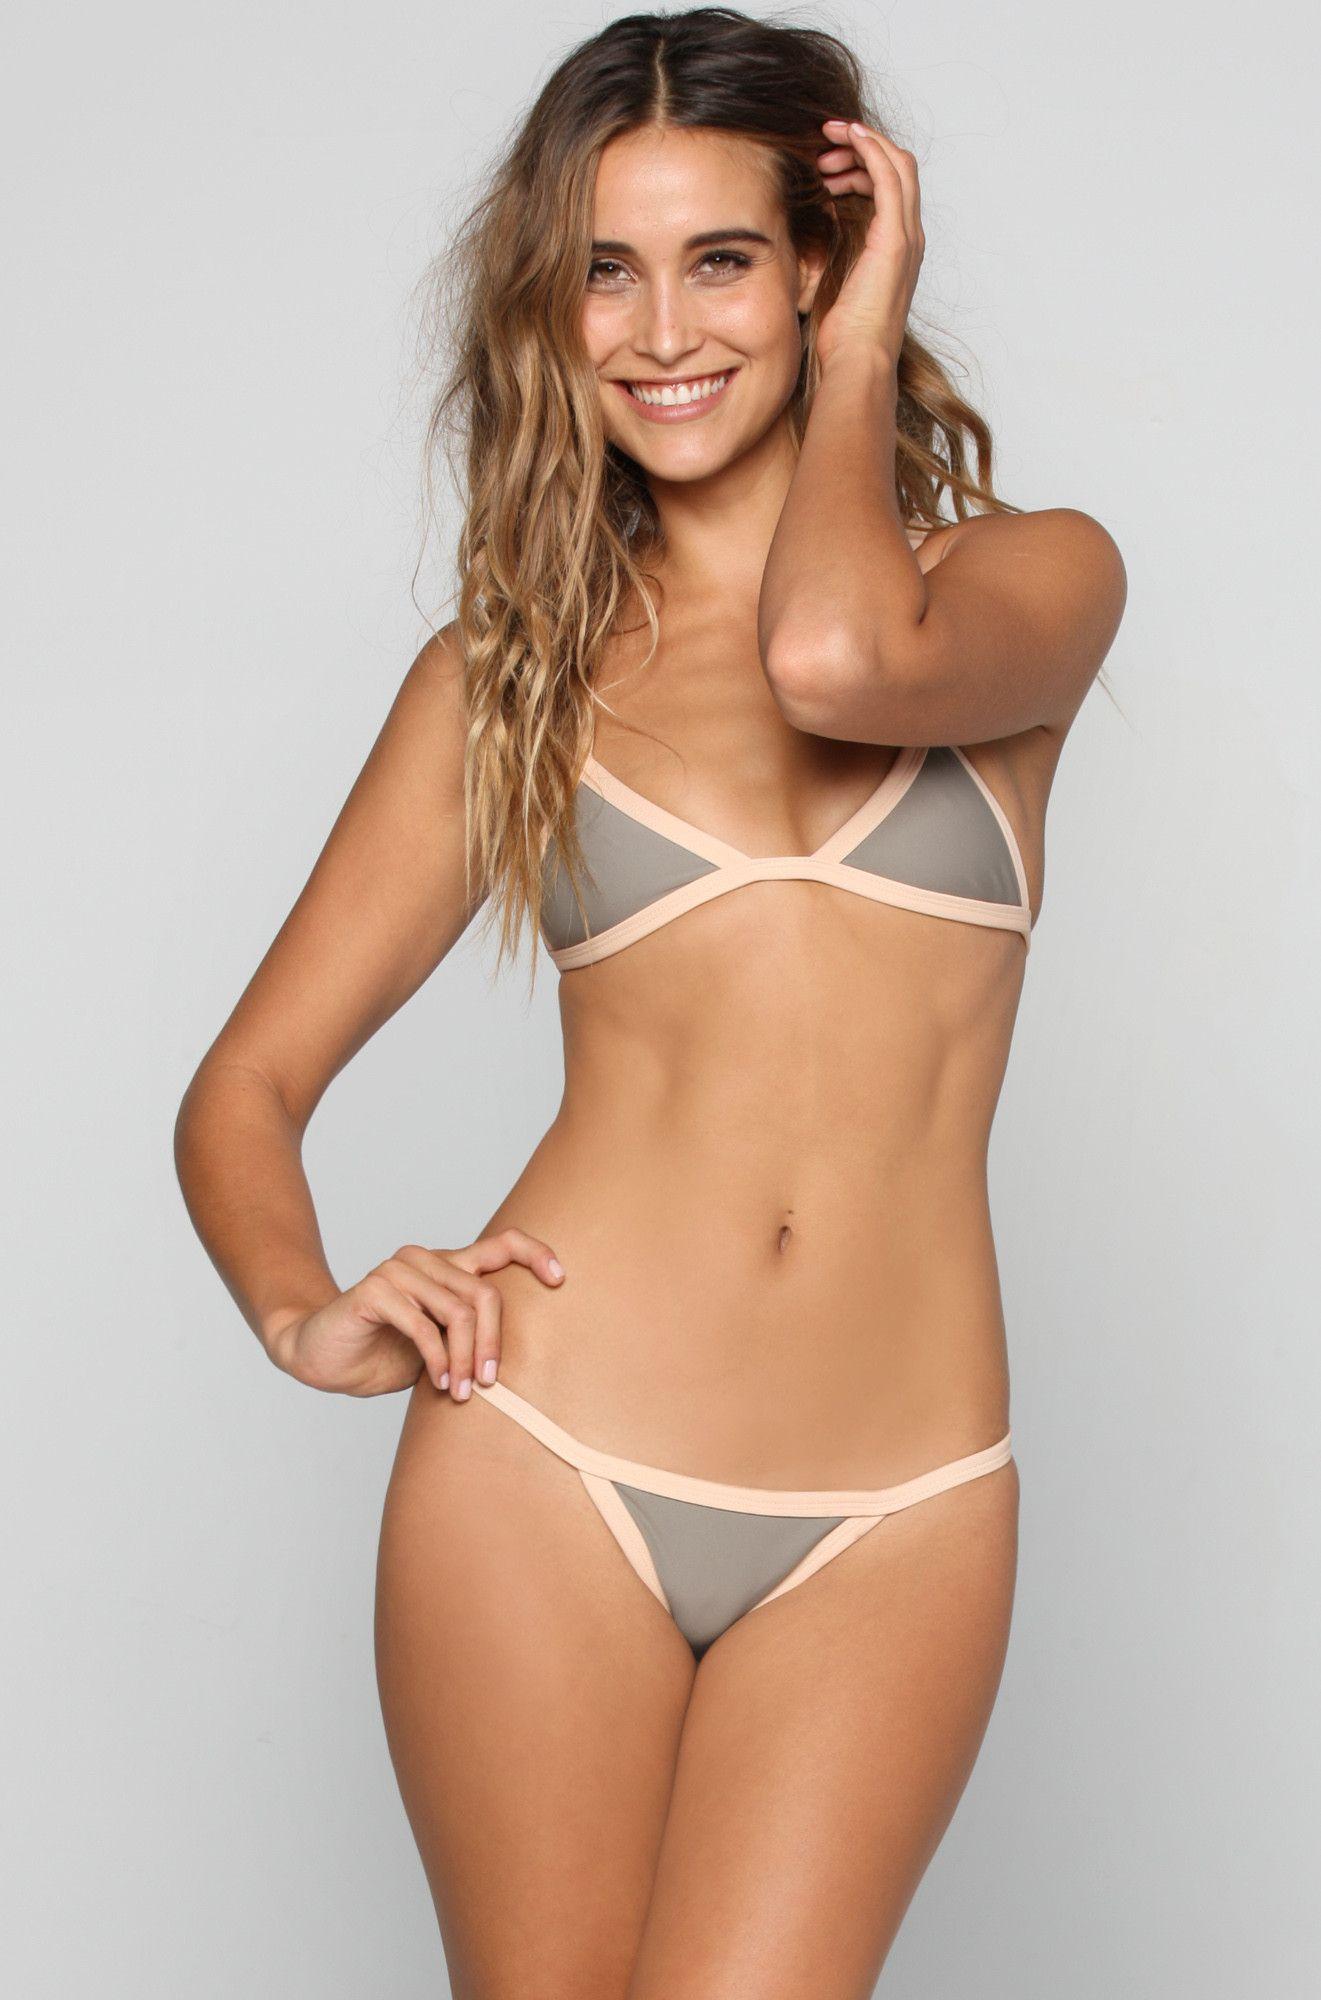 butt Hot Anna Herrin naked photo 2017